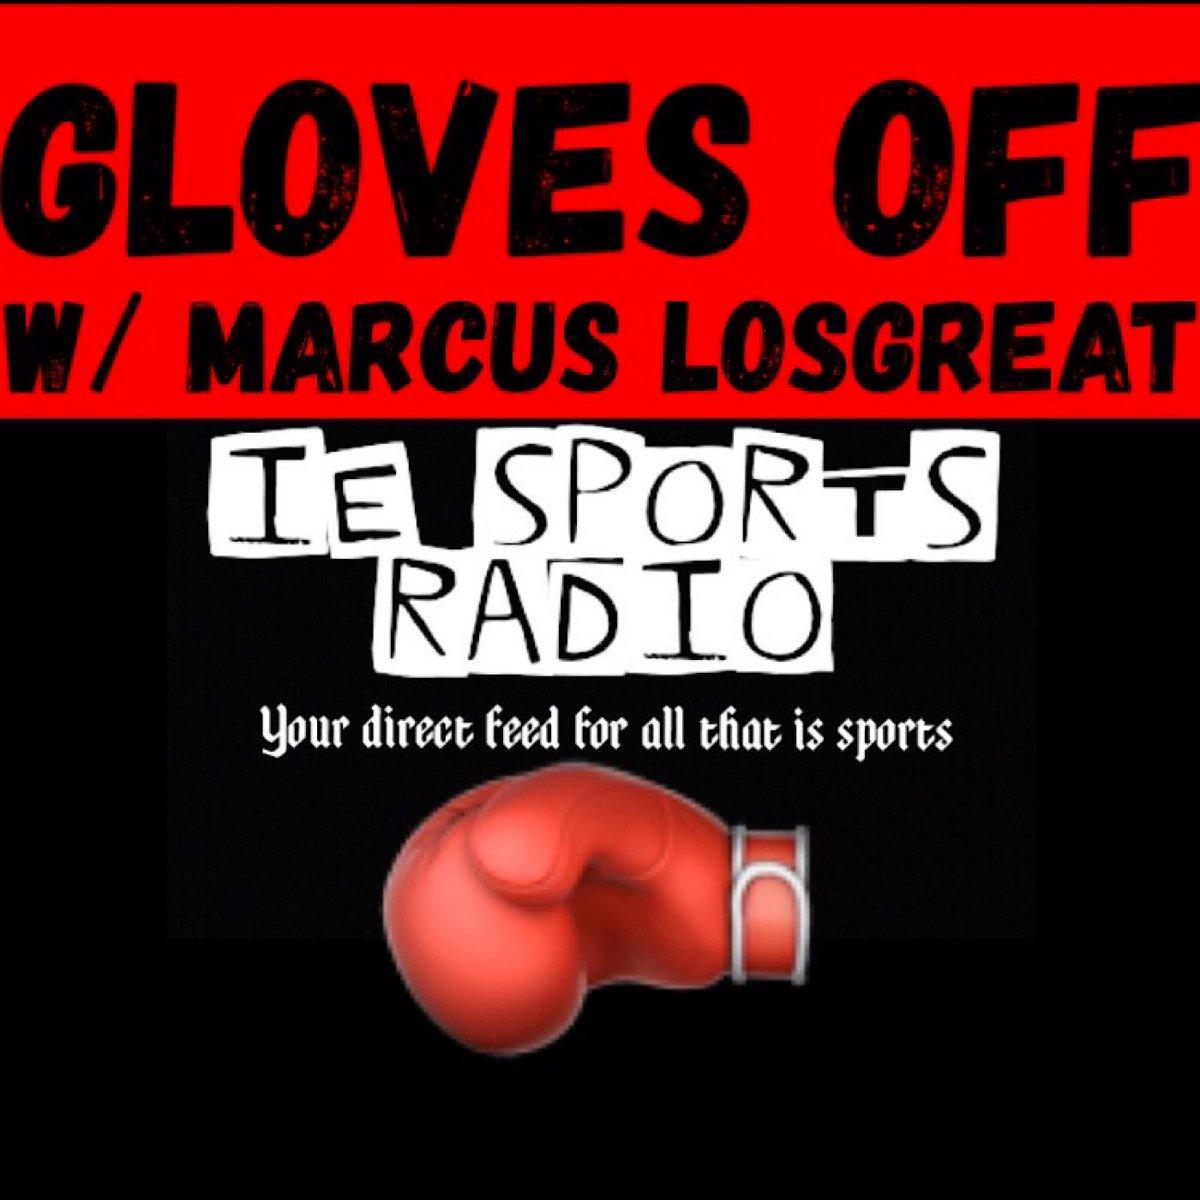 Tune in live for #GlovesOff with @MLosgreat! #WilderFury2 #Boxing #MMATwitter #UFCFightNight167 #ShowtimeBoxing #ShoBox #GarciaFonseca #PlantFeigenbutz #DAZNUSA #PBC #GlovesOffBoxing #Boxeo #PremierBoxing https://www.spreaker.com/user/iesportsradio…